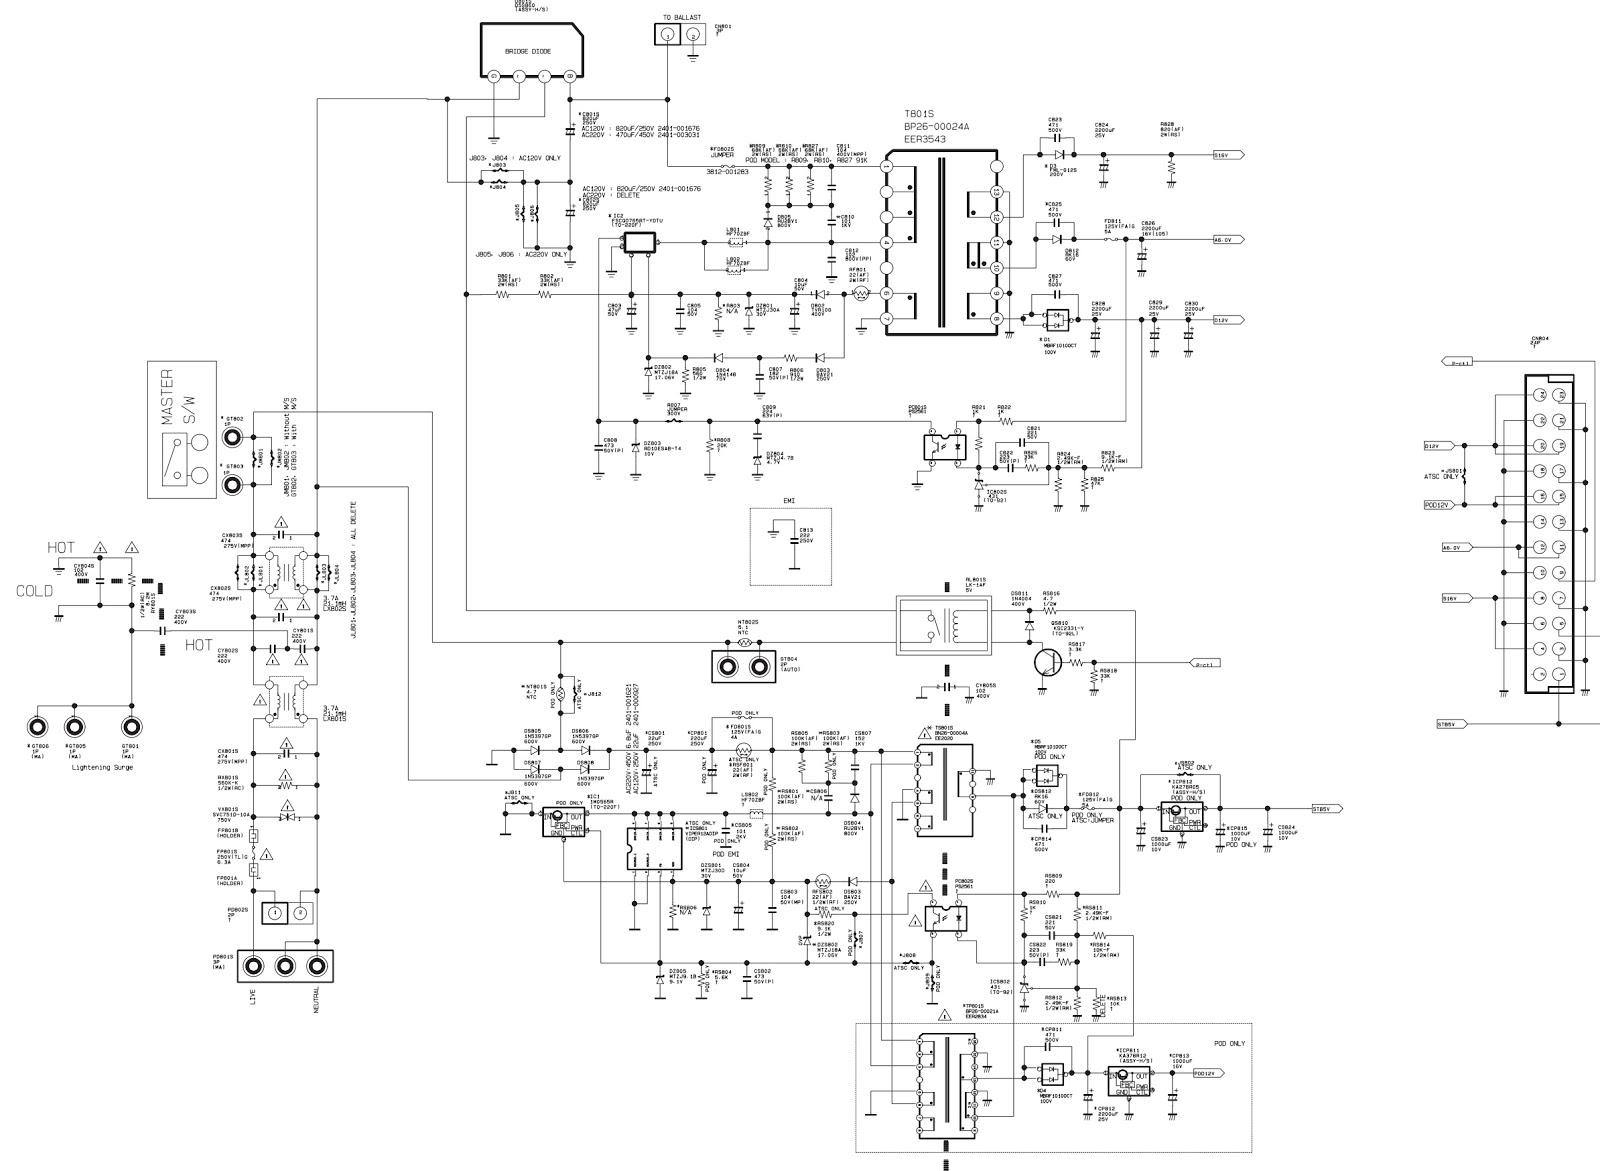 hight resolution of samsung dlp wiring diagram wiring diagram info samsung dlp wiring diagram